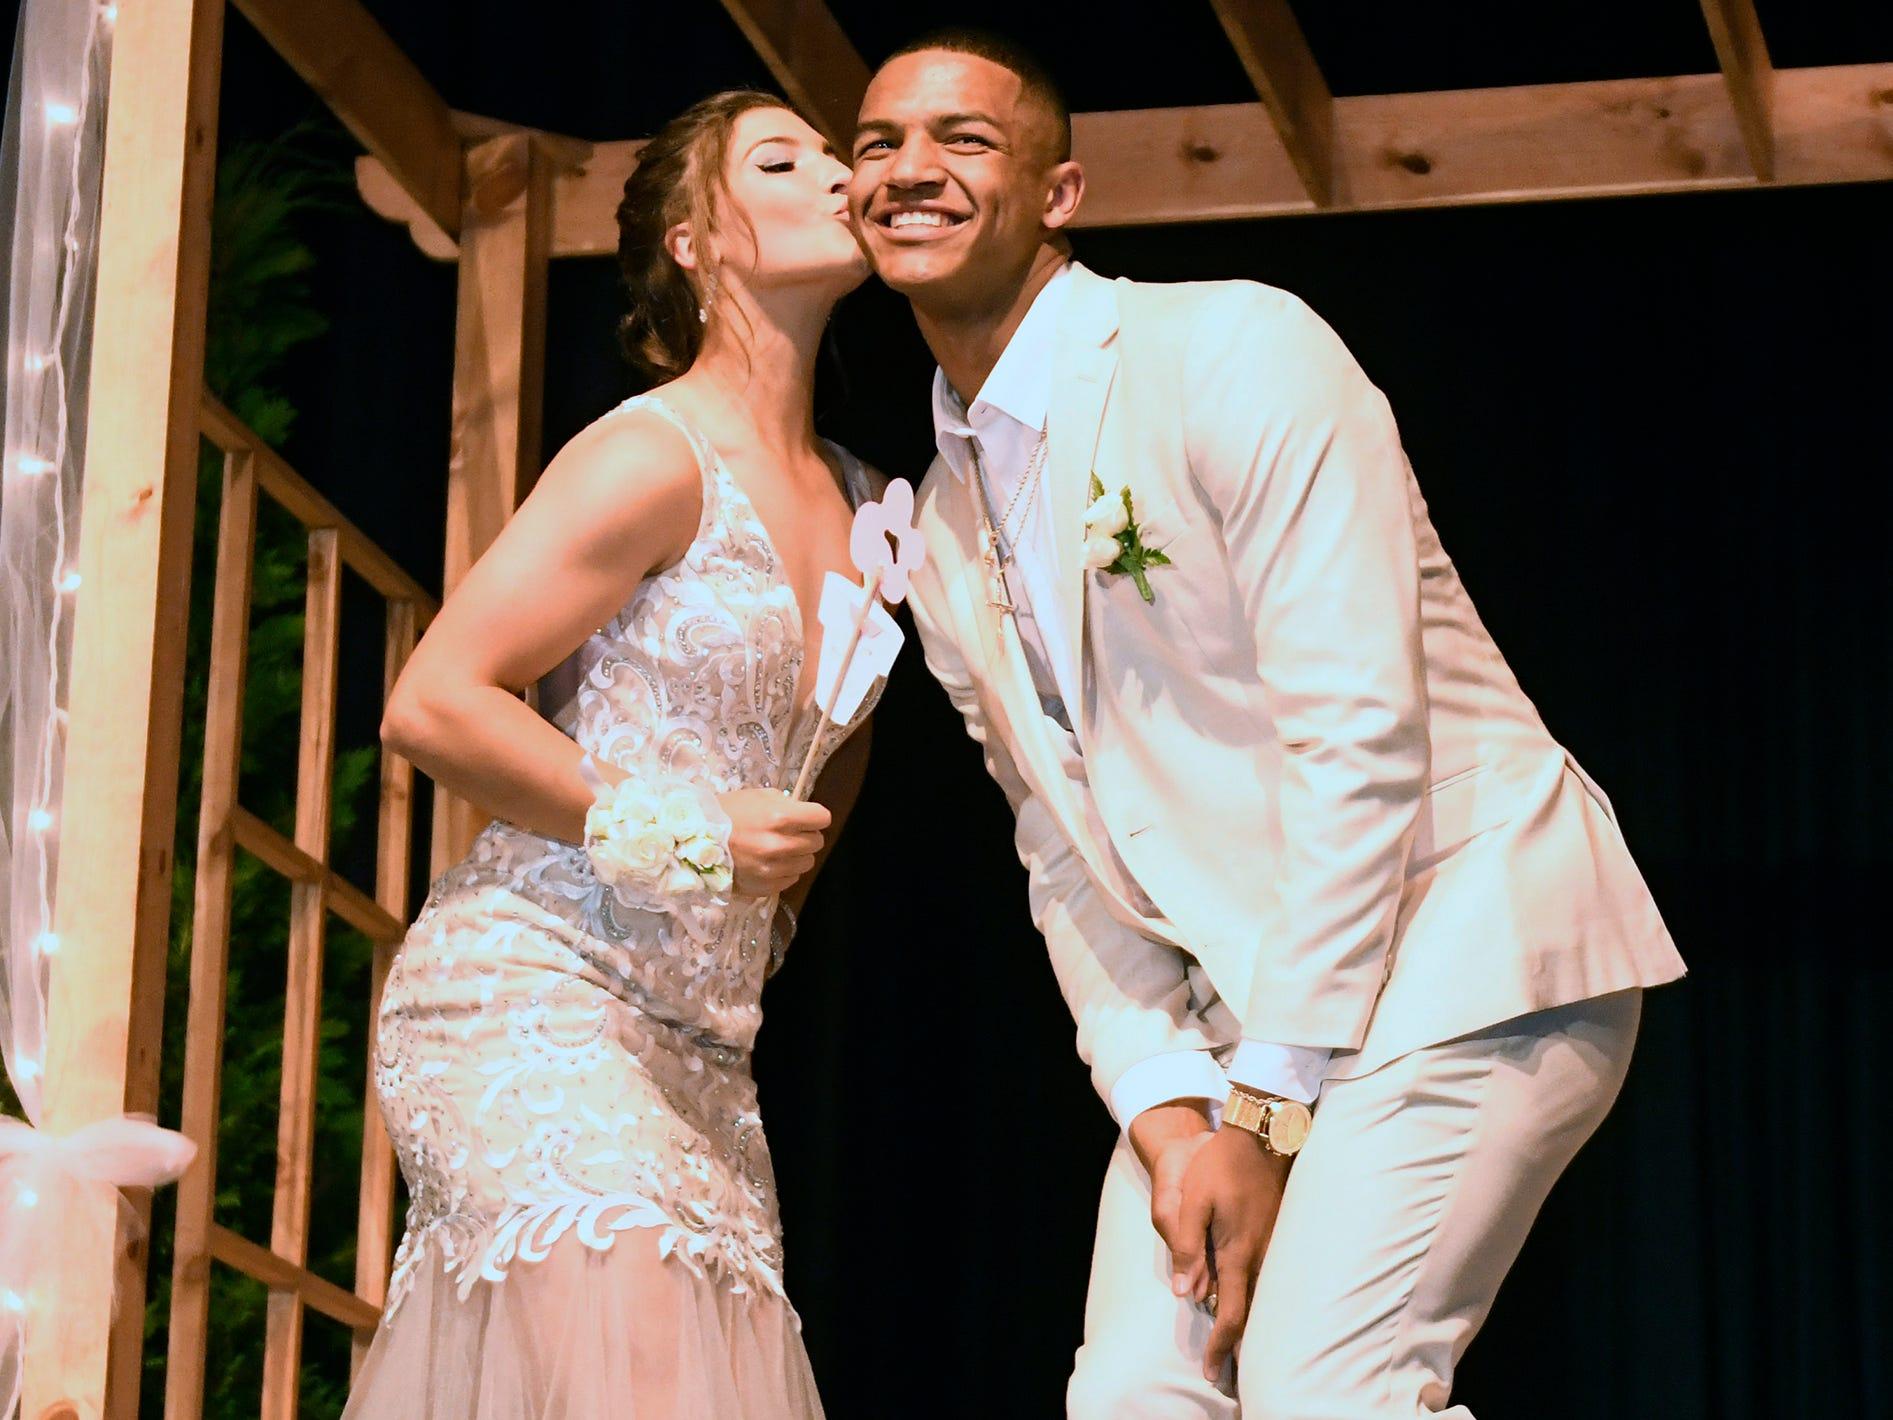 Buena Regional High School held its pre-prom promenade in the school auditorium on Friday, May 3, 2019.